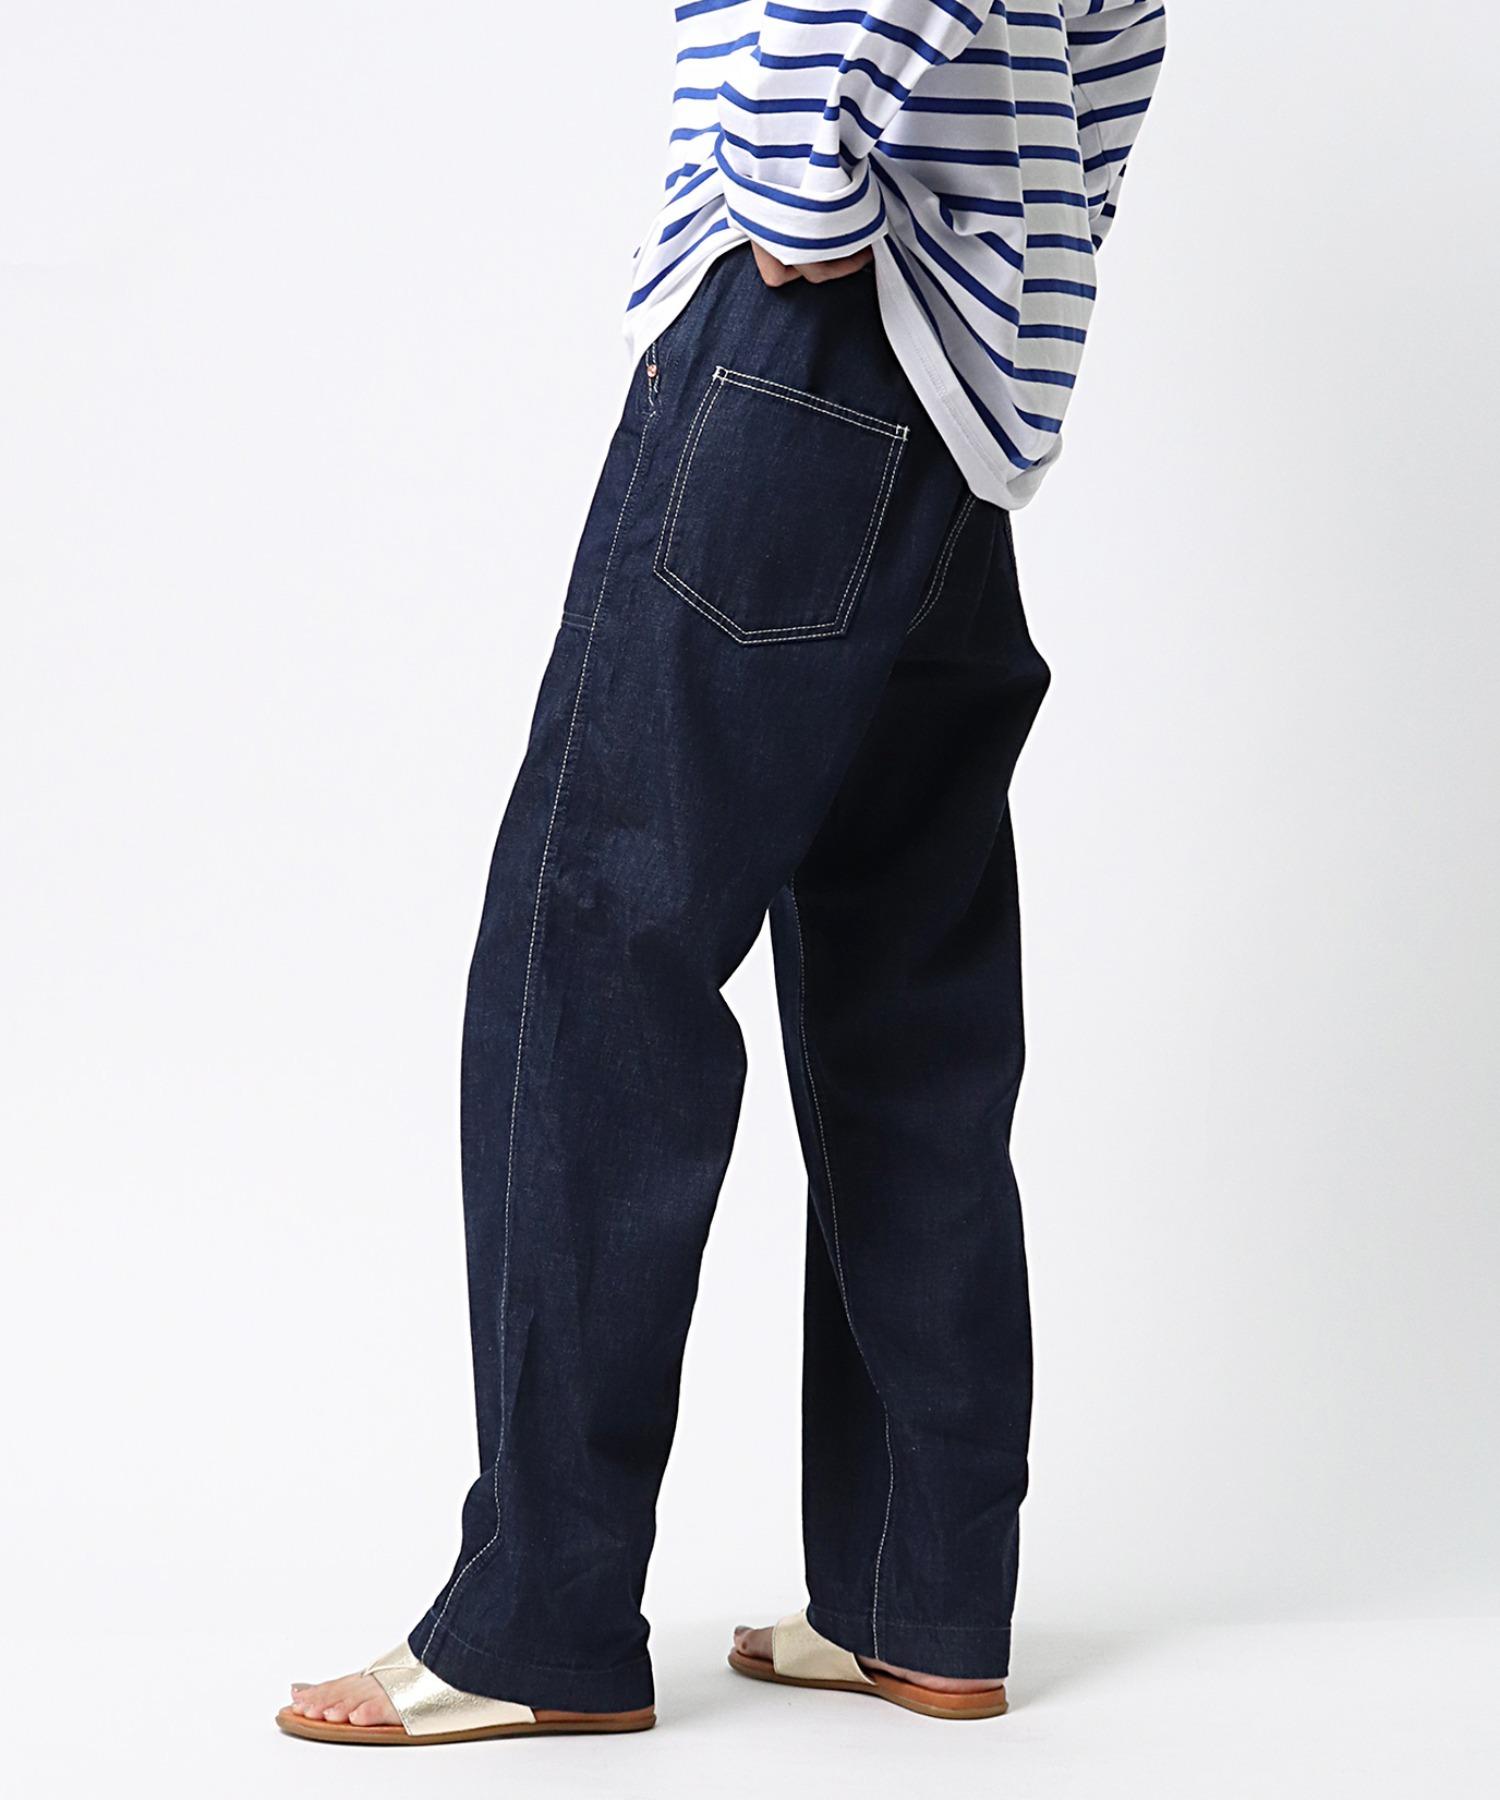 【GRANDMA MAMA DAUGHTER/グランマ ママ ドーター】# DENIM SIDE ZIP PANTS サイドジップデニム GP007OW